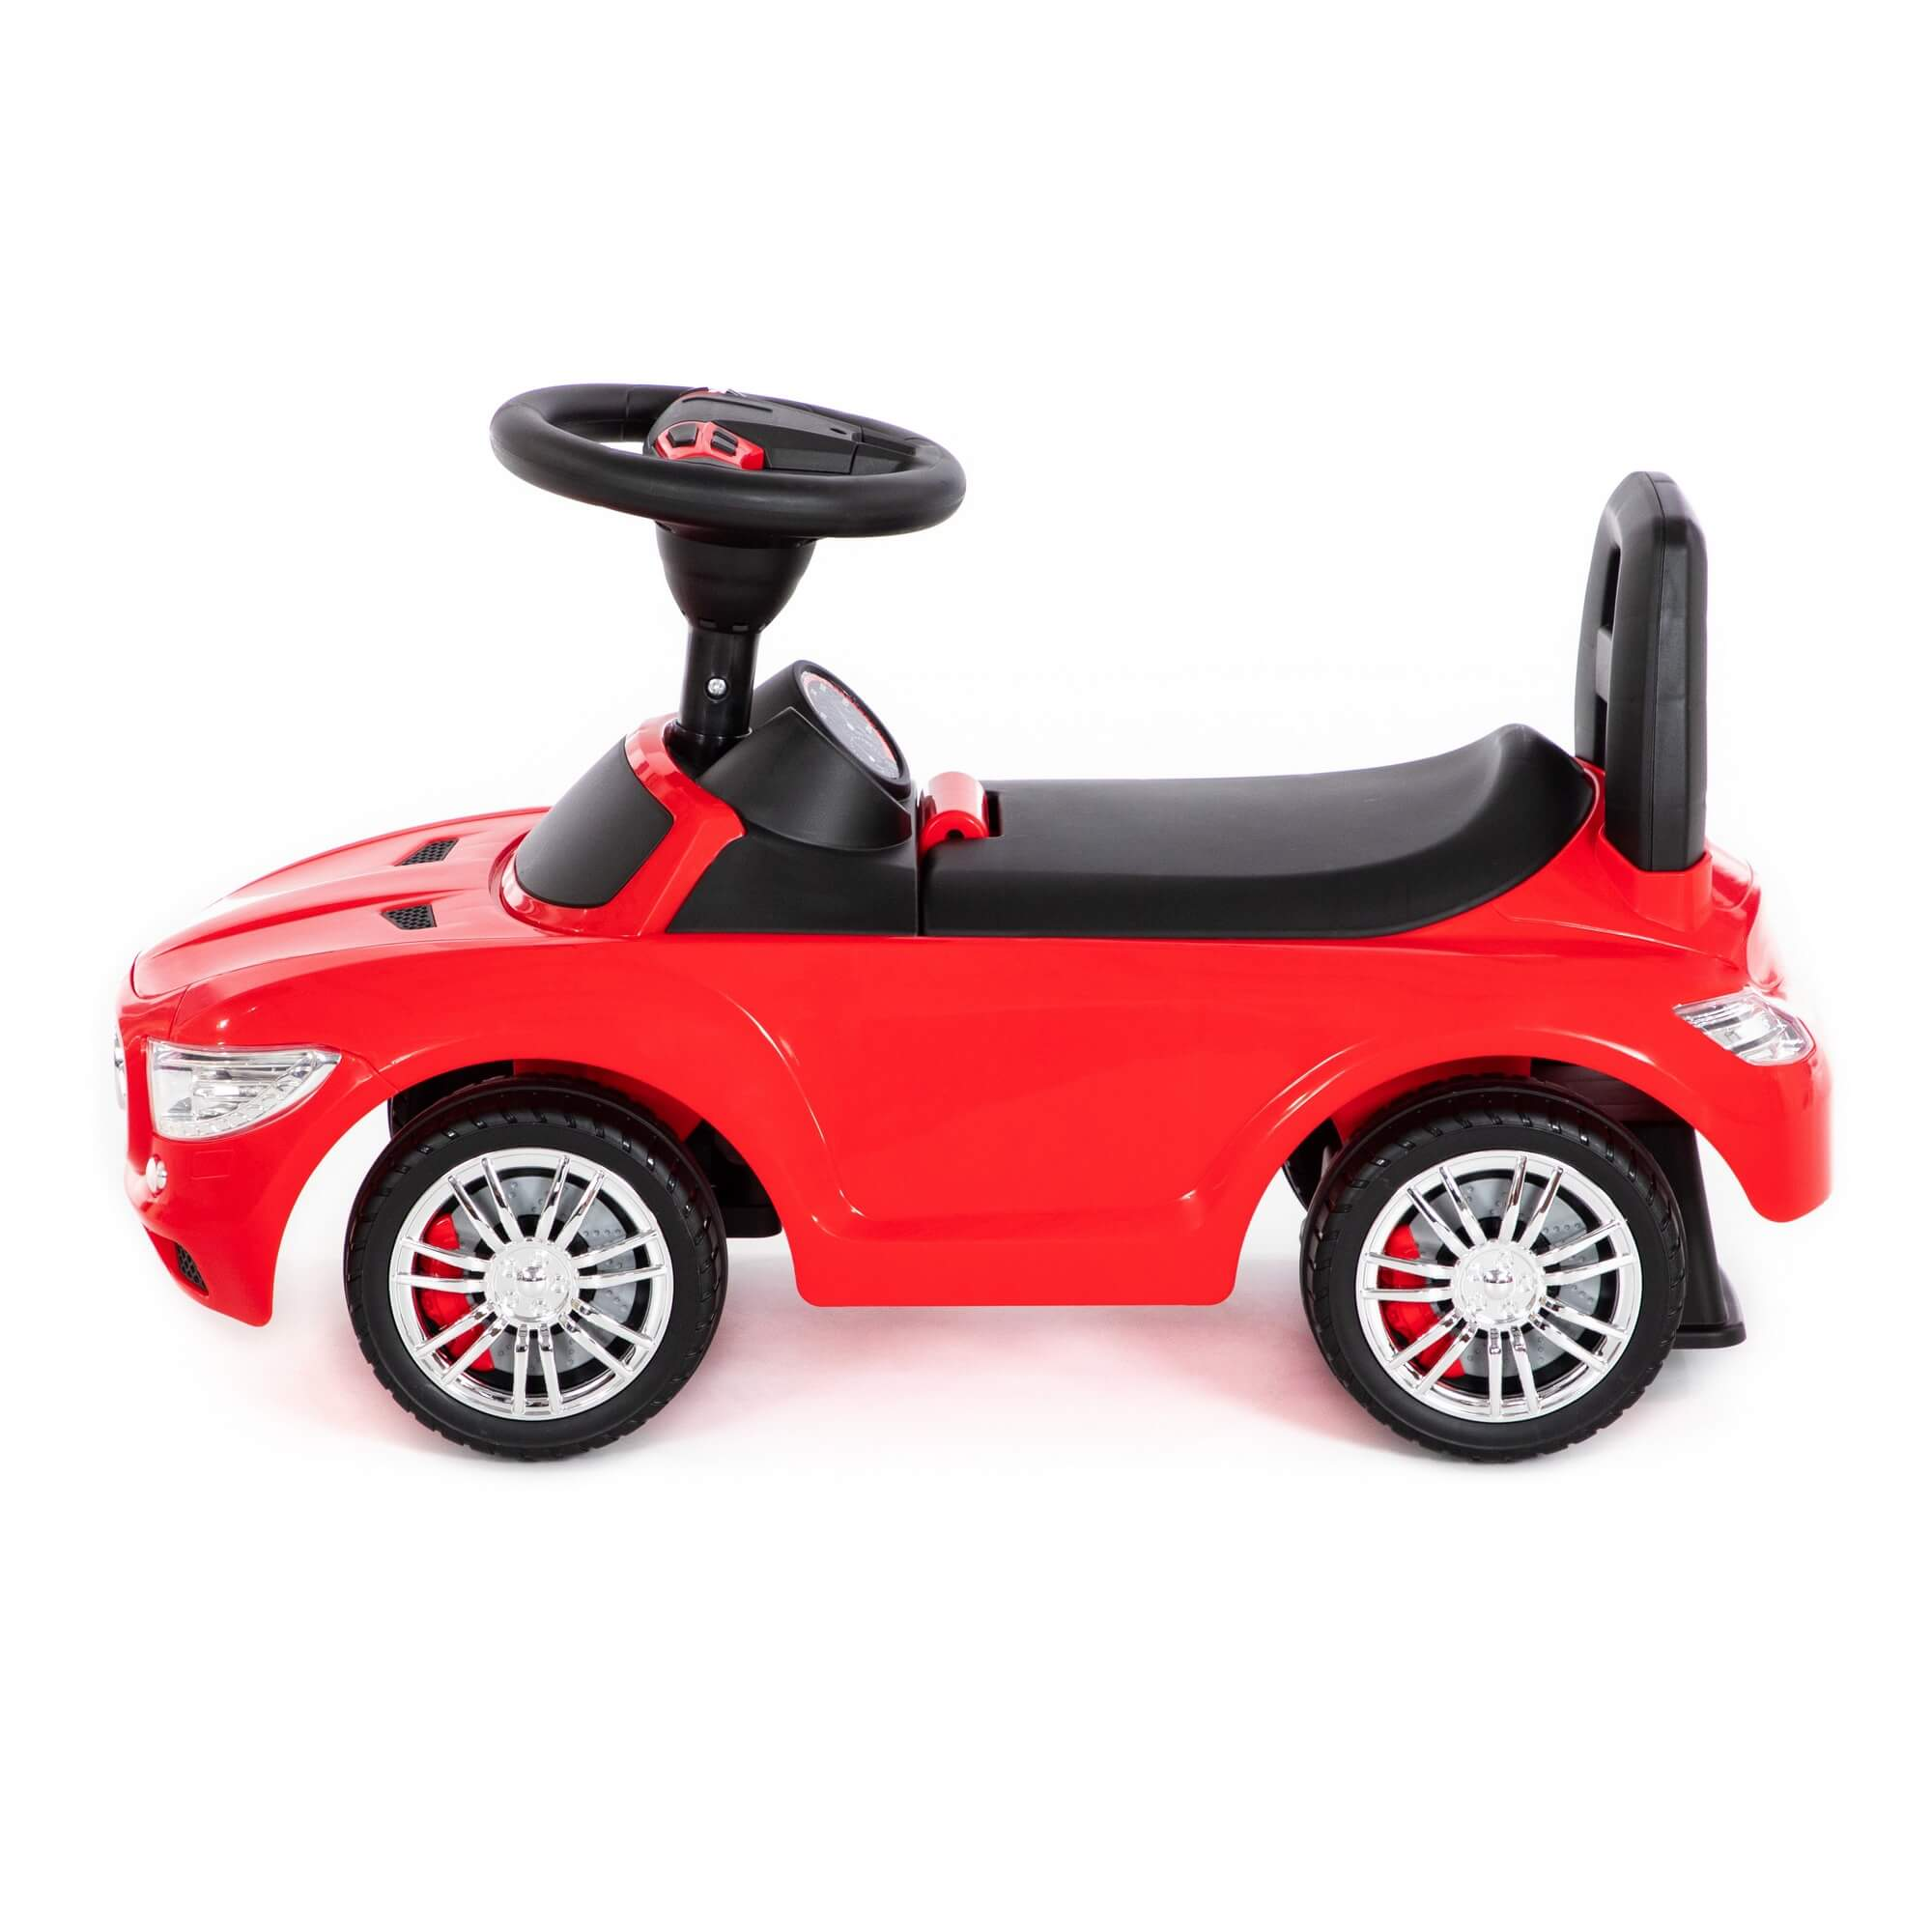 SuperCar sürümeli araba No:1 ses sinyali ile (pembe) Ref. 84460 - photo #2